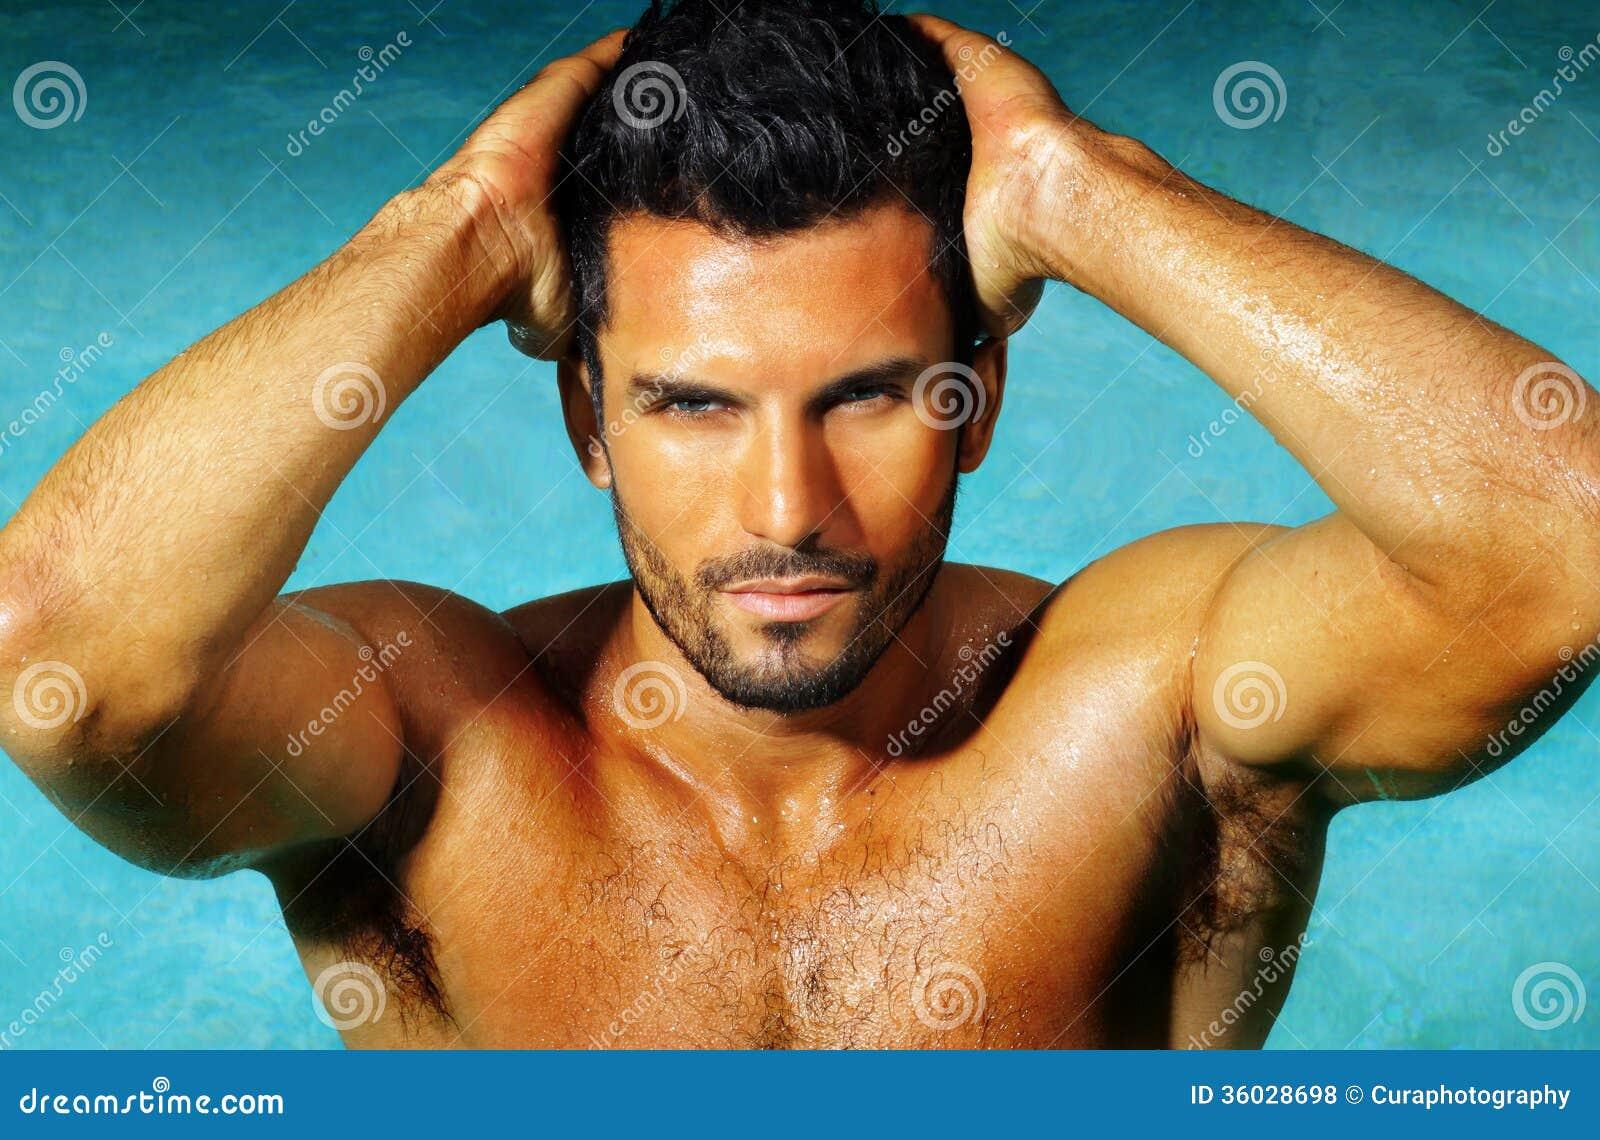 Girles nude cute muscle men fuck